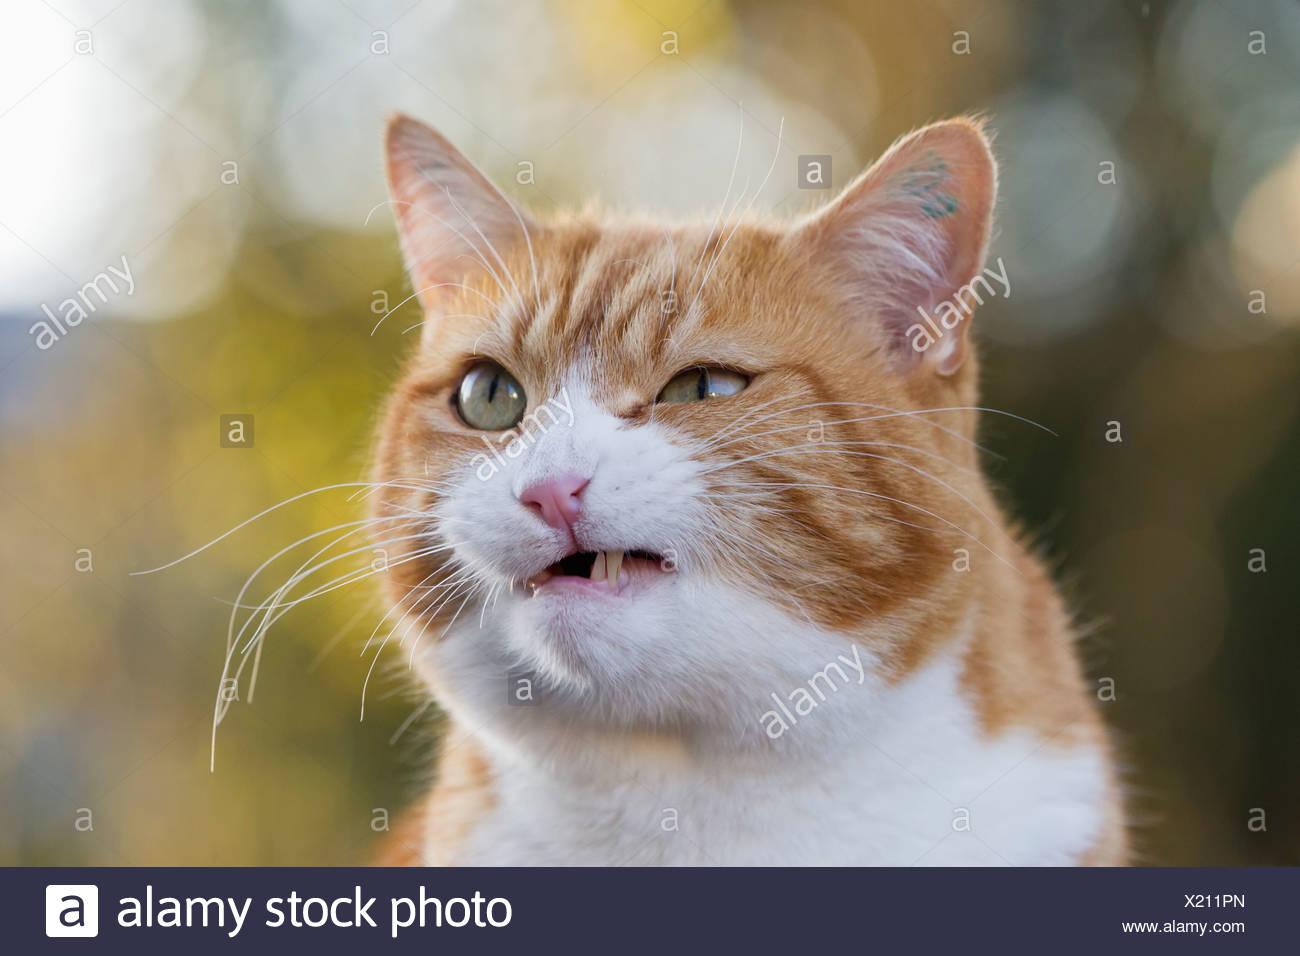 Alemania, Baviera, cerca de enojado Shorthair Europeo cat. Imagen De Stock